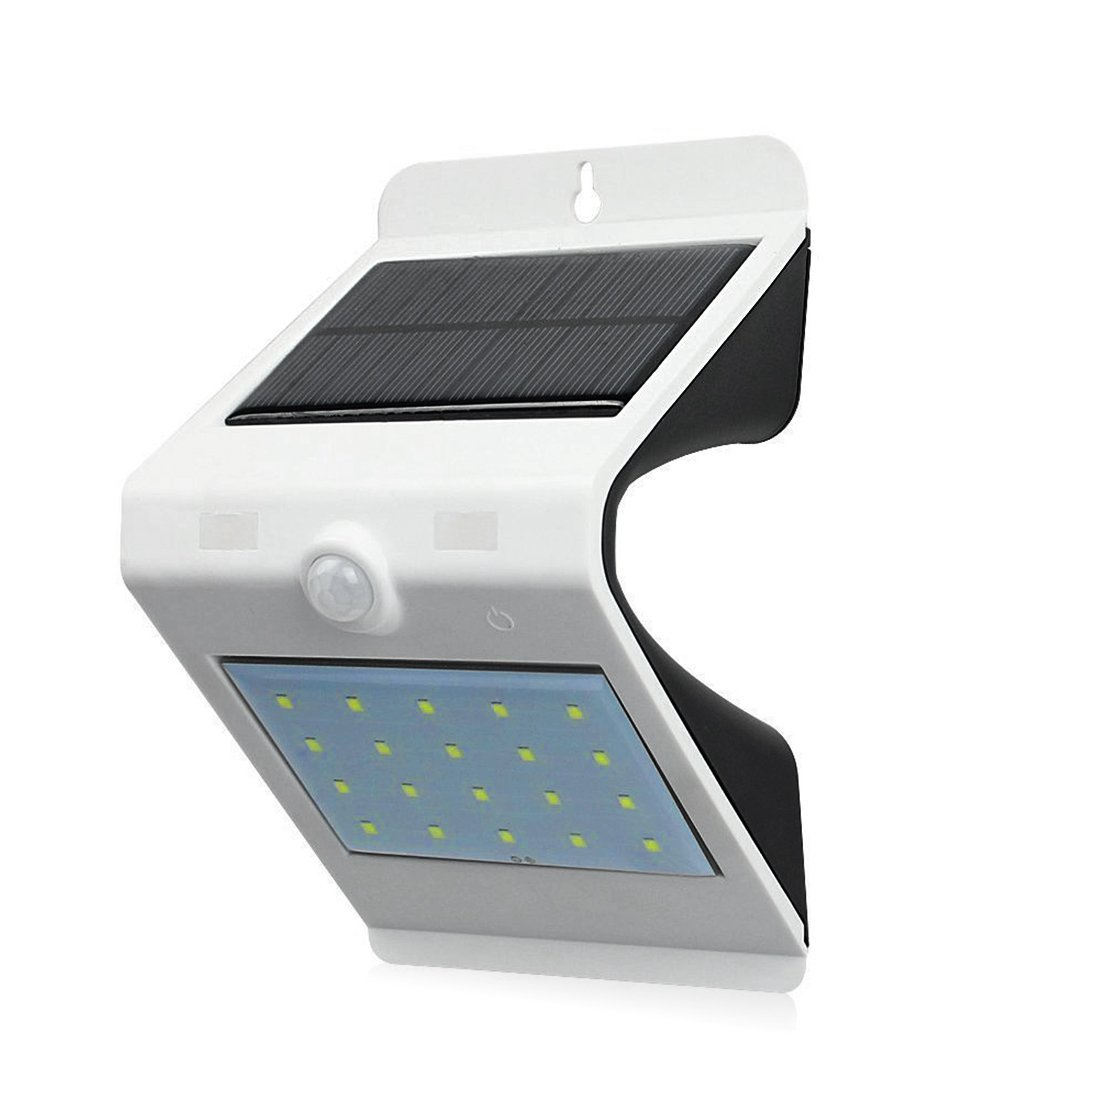 Solar Poweredモーションセンサー屋外セキュリティライトアウトドアwebsun 20 + 4 LED壁ライトホワイト B071YH214J 11409